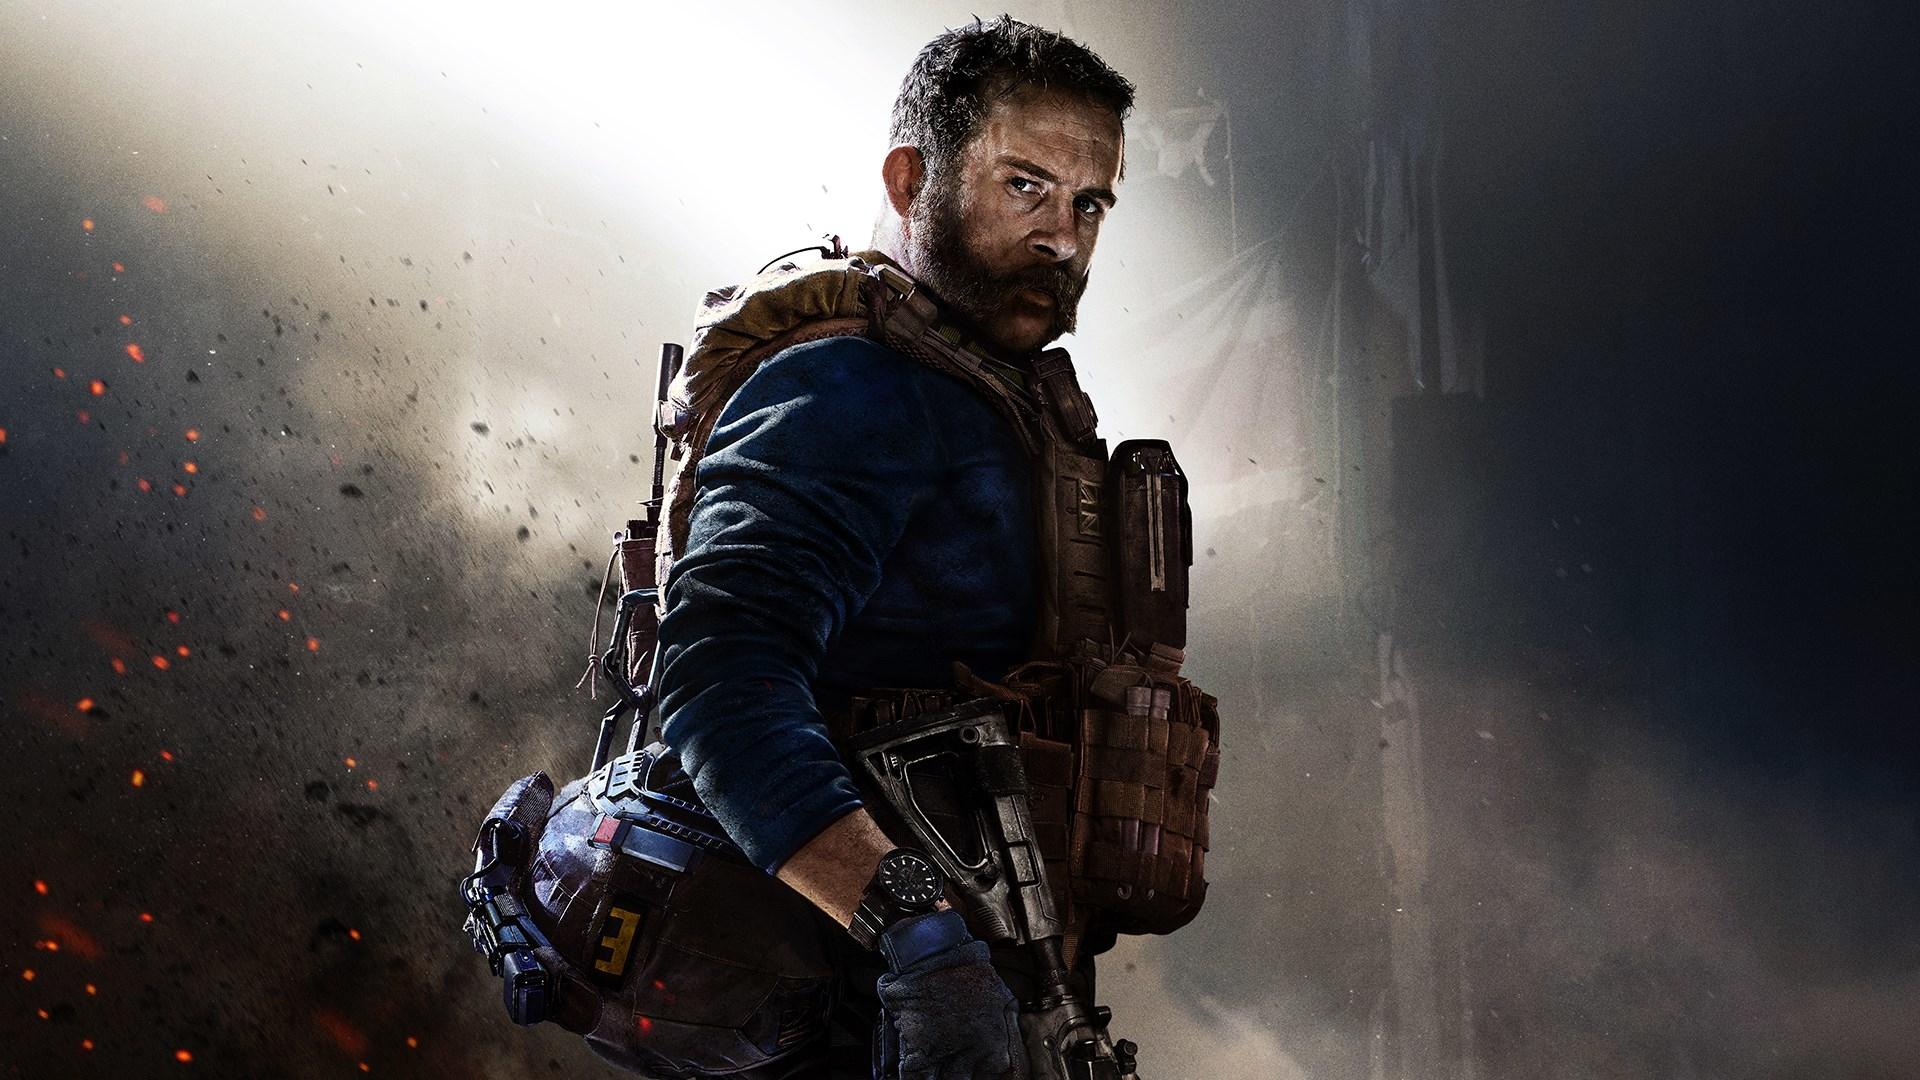 Call Of Duty Modern Warfare Game Poster Wallpaper Hd Games 4k